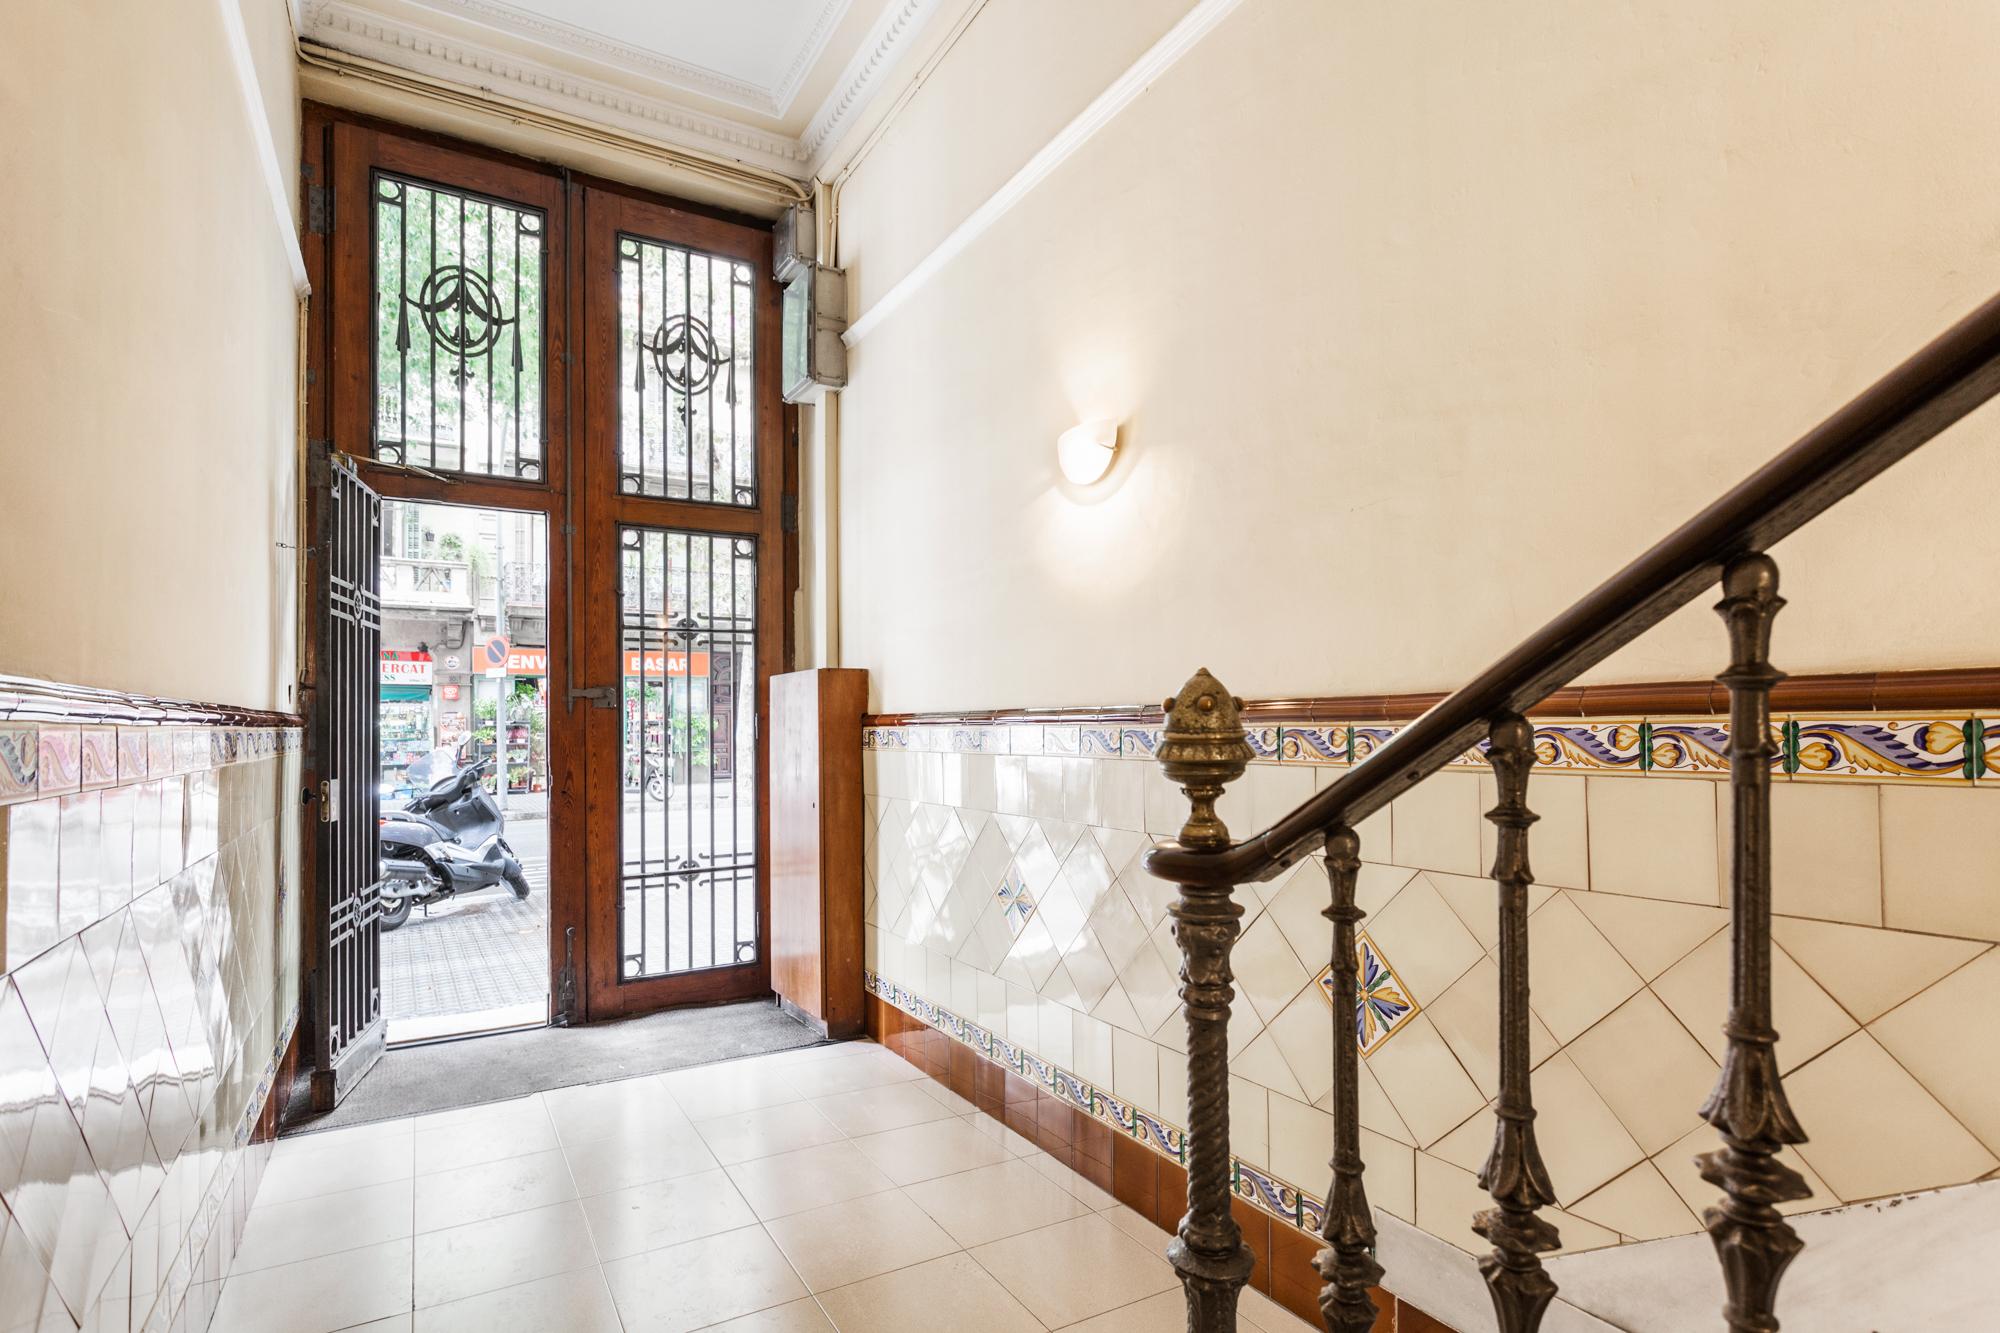 Piso de dise o en la calle aribau my house barcelona - Permiso obras piso barcelona ...